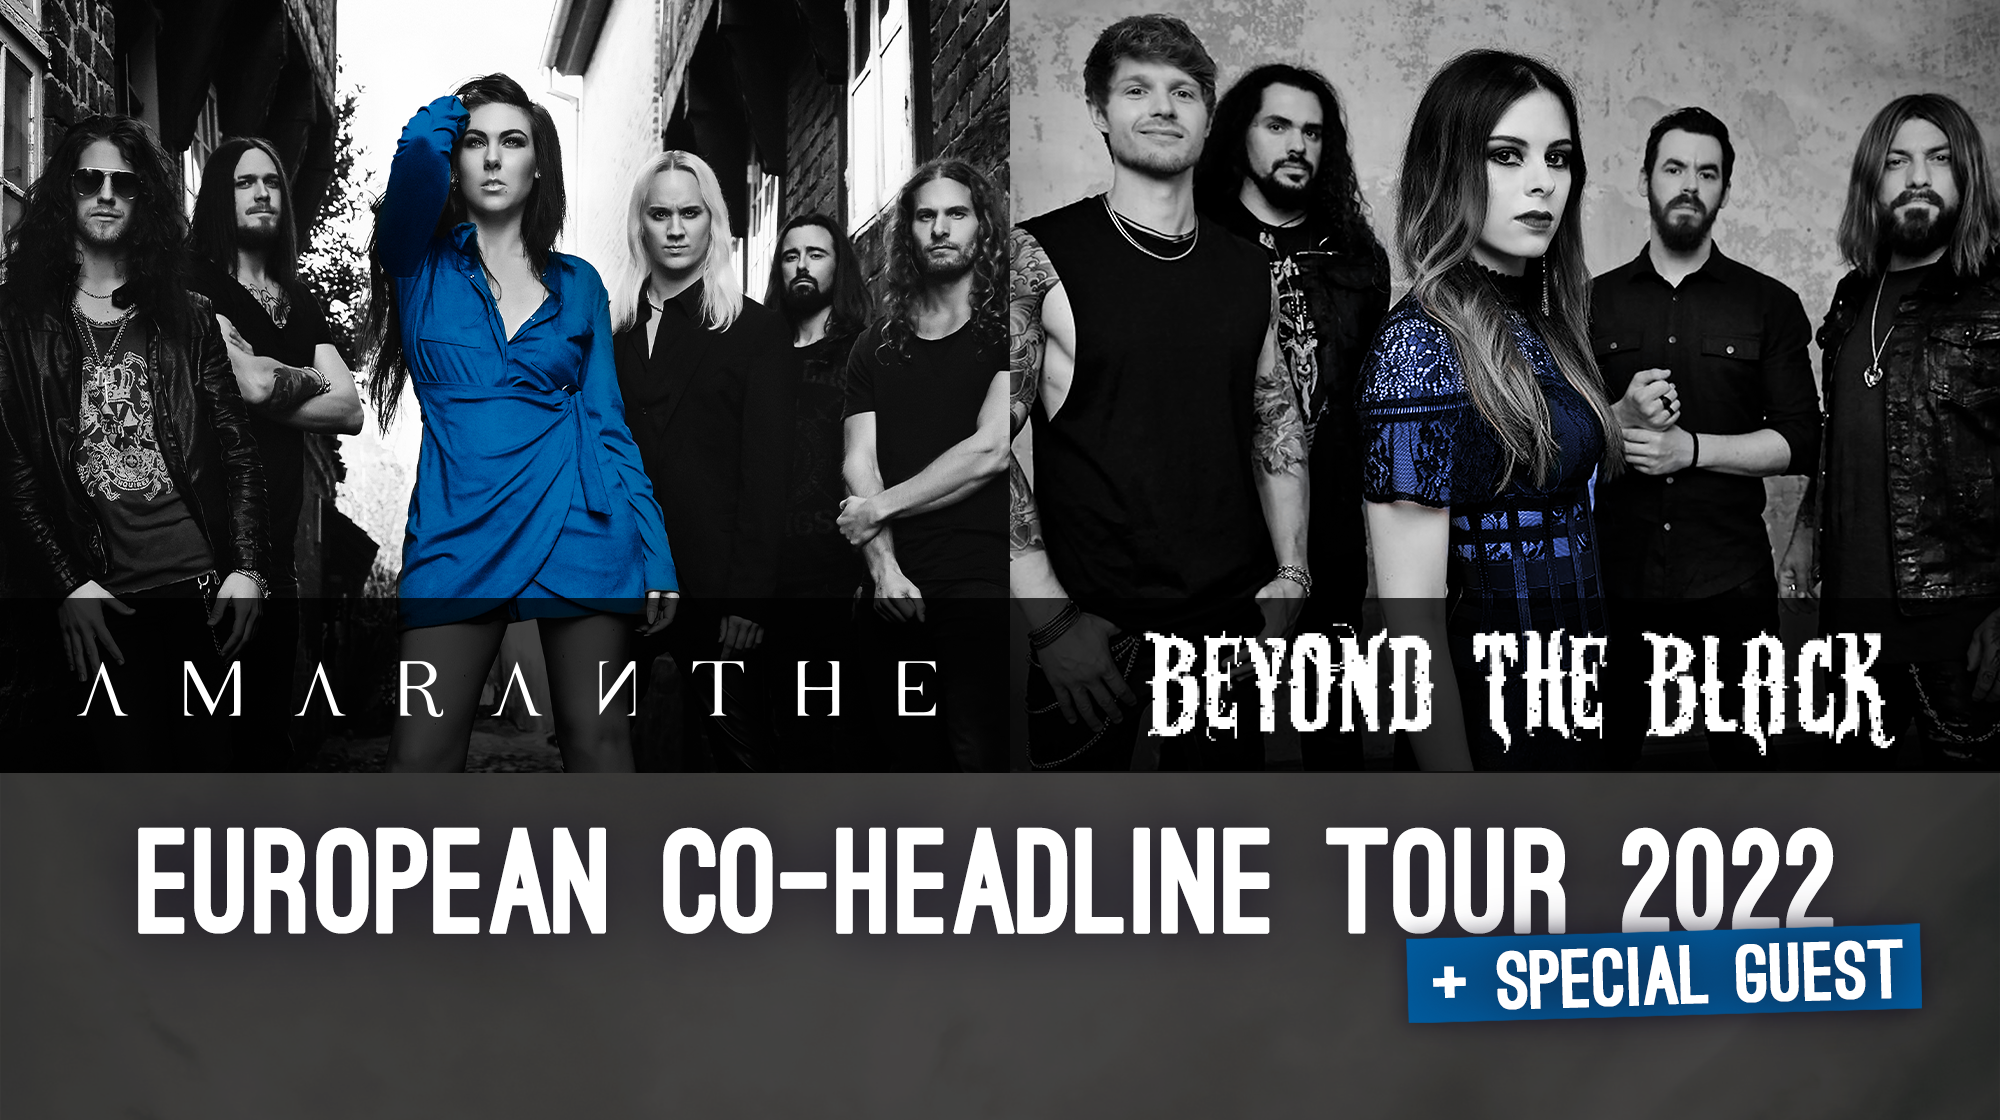 Beyond the Black & Amaranthe - CO-Headline Tour 2022